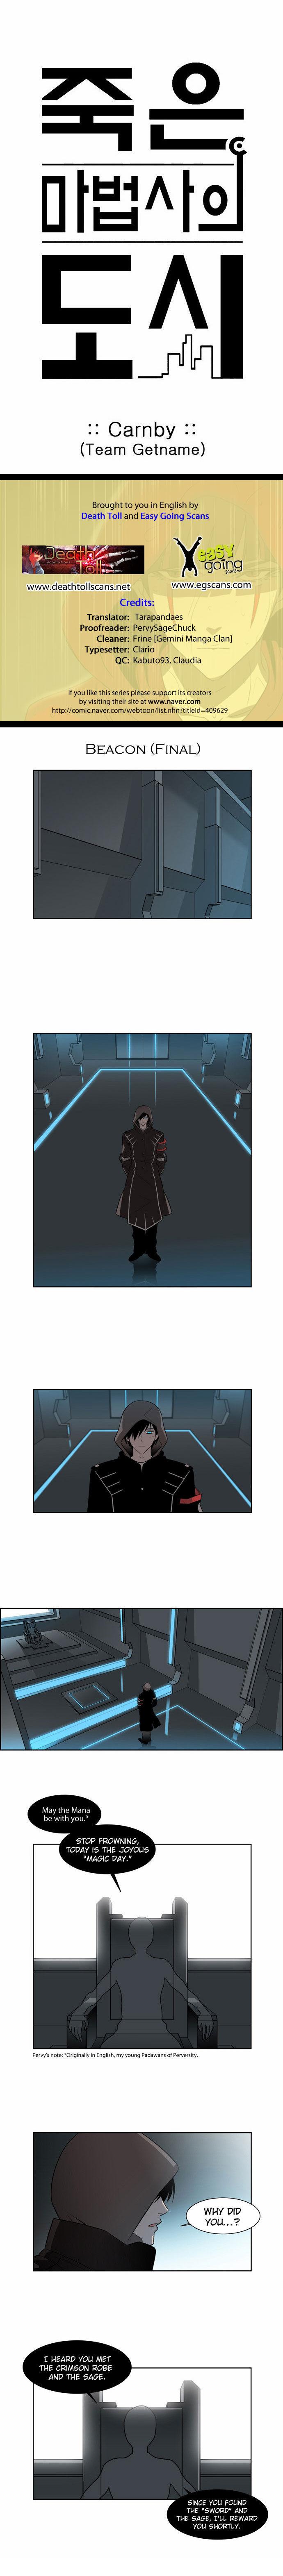 City of Dead Sorcerer 44 Page 2